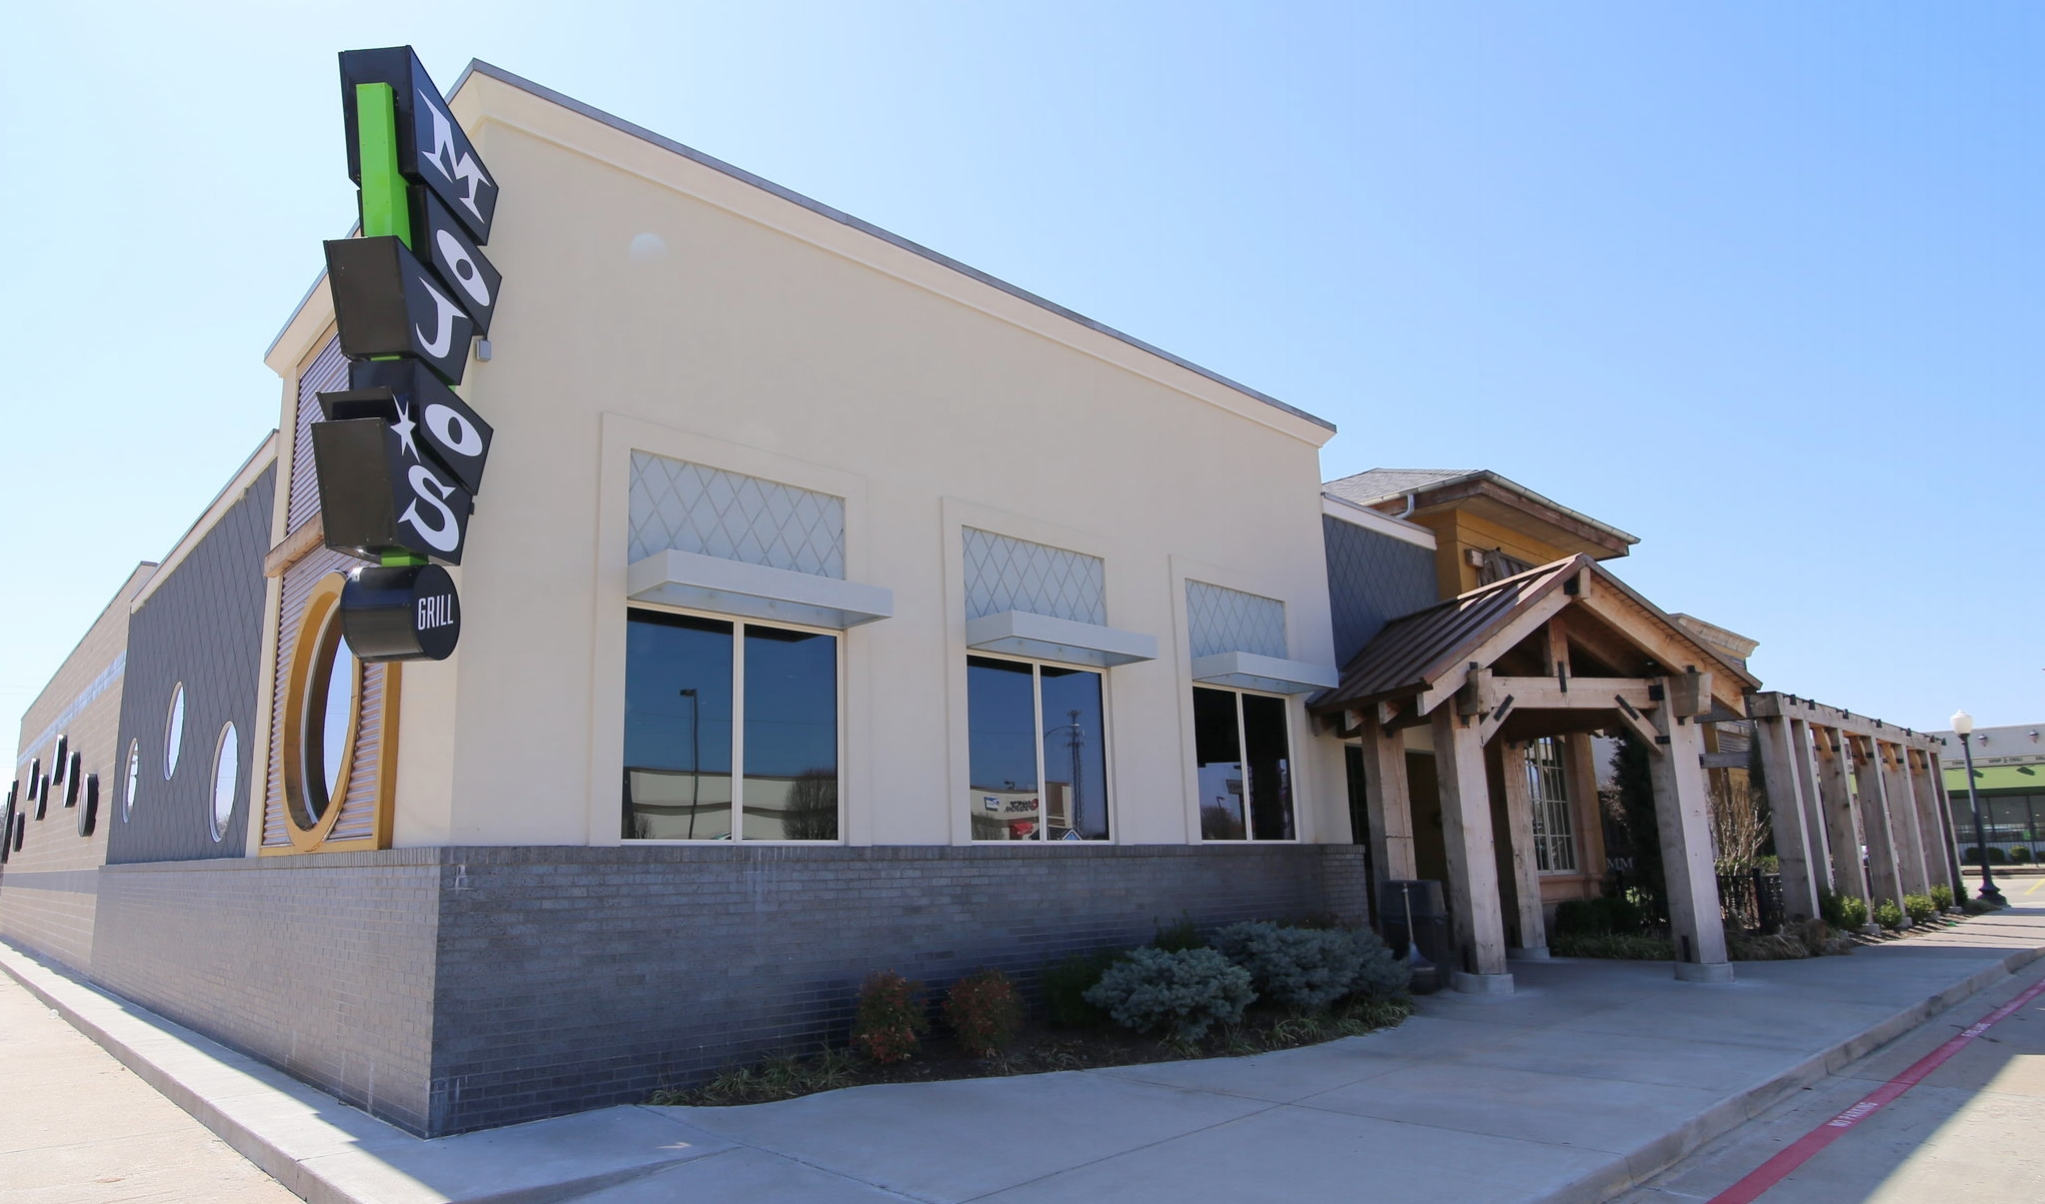 223 E. Hall of Fame Avenue, Stillwater, OK